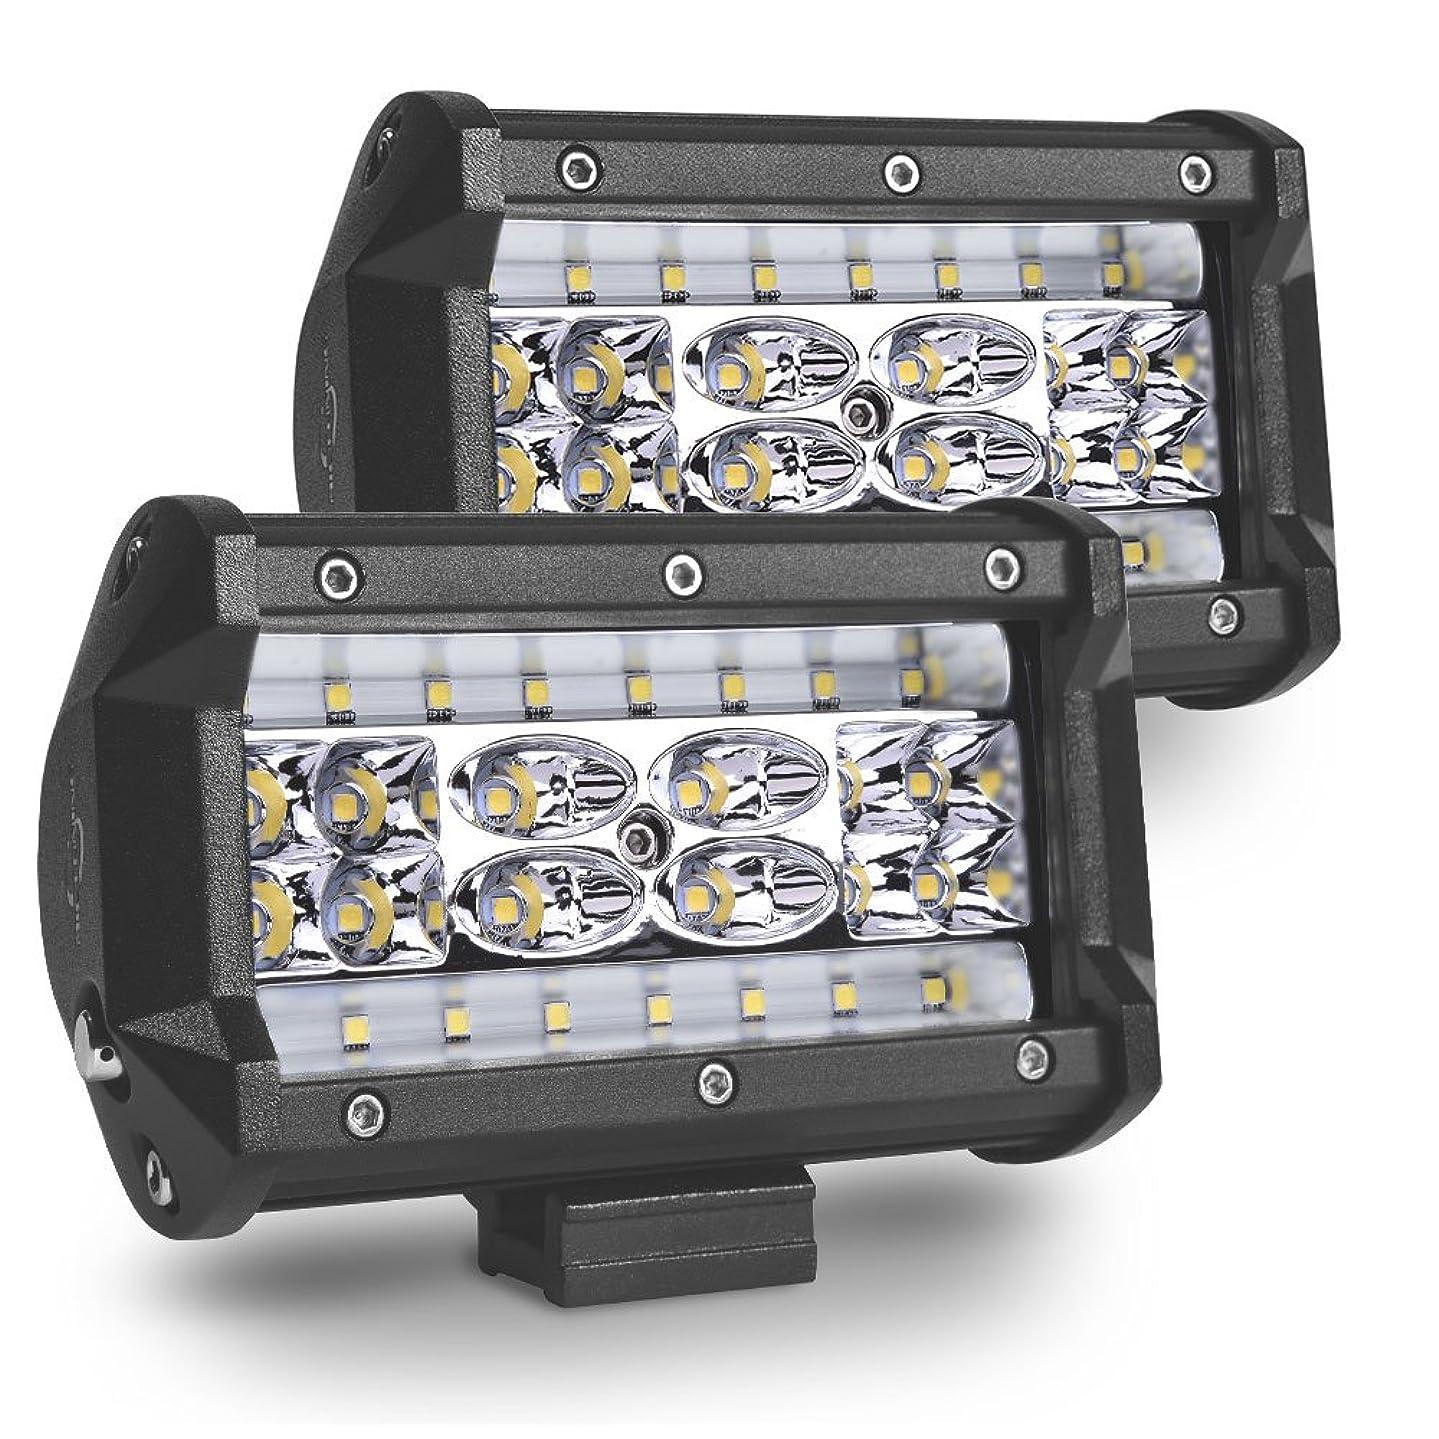 MICTUNING 2Pcs 5inch LED Pods Quad-Row Off Road LED Light Bar 4200LM Spot Flood Combo Beam Work Light Driving Fog Lamps for Jeep SUV ATV UTV Truck Boat